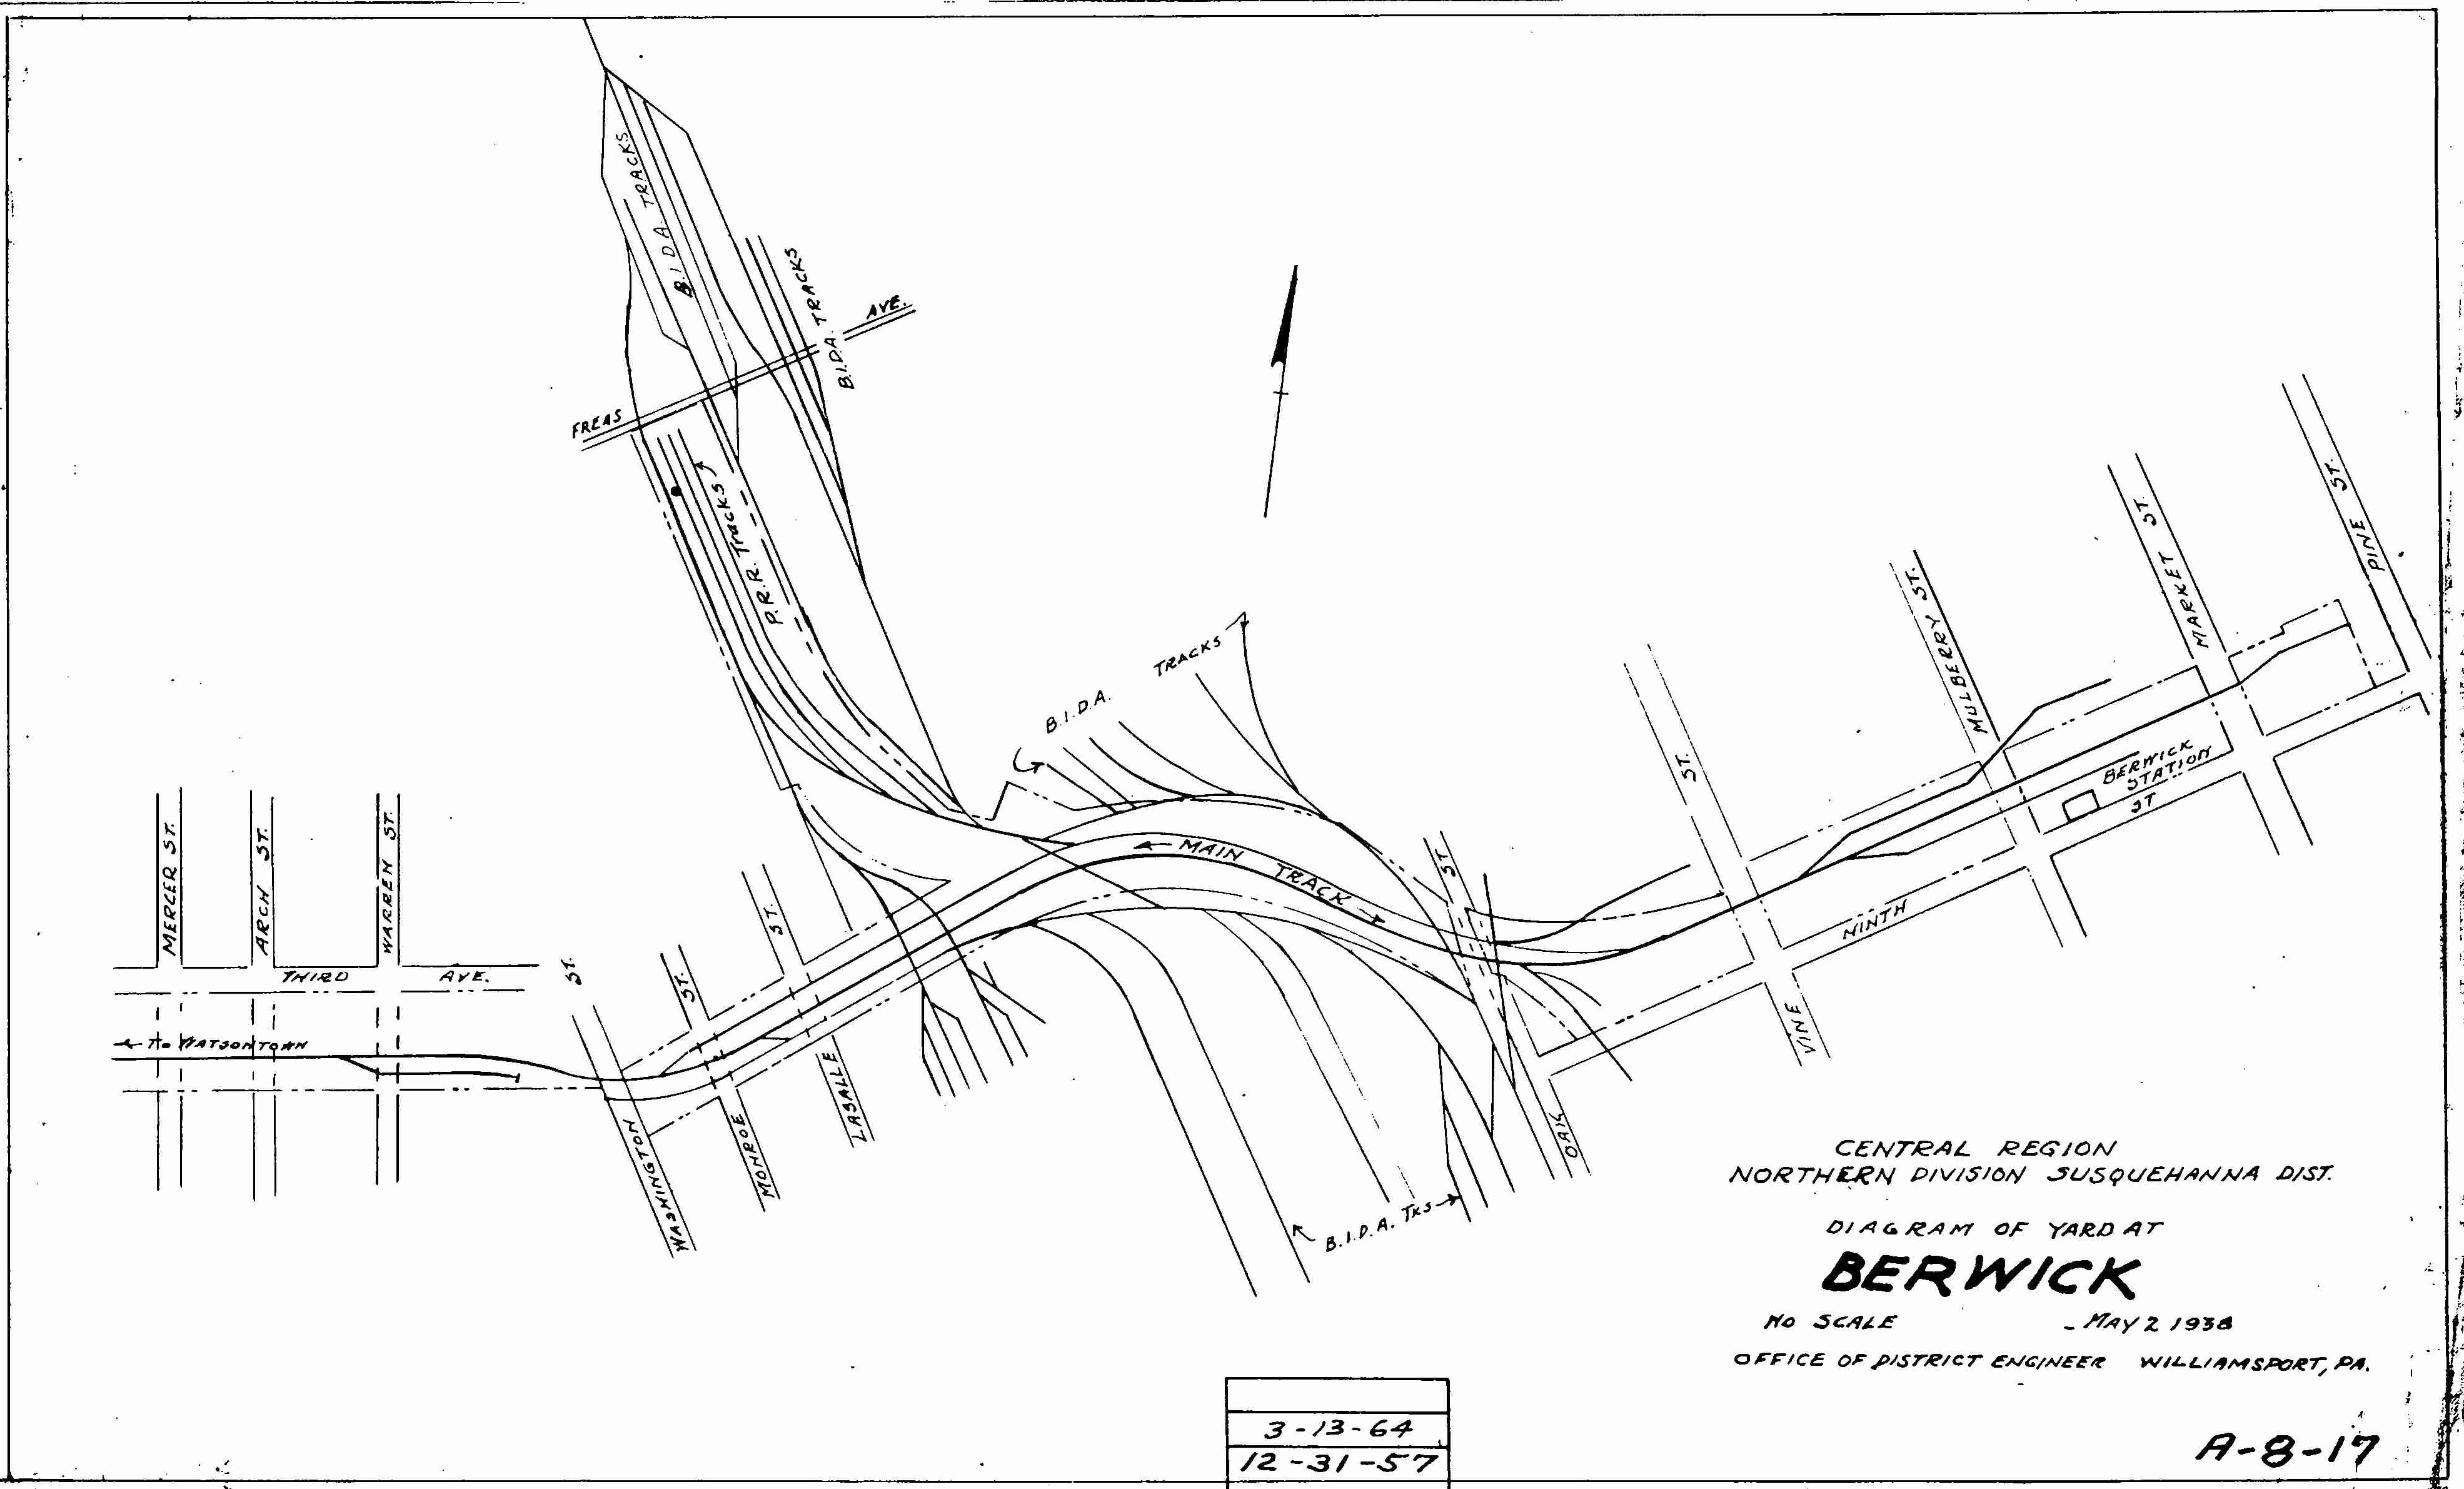 Berwick1 Railroad Yard Schematic Diagrams on computer circuit board, samsung lcd tv, am tube radio, sony tv, digital multimeter, hvac system,